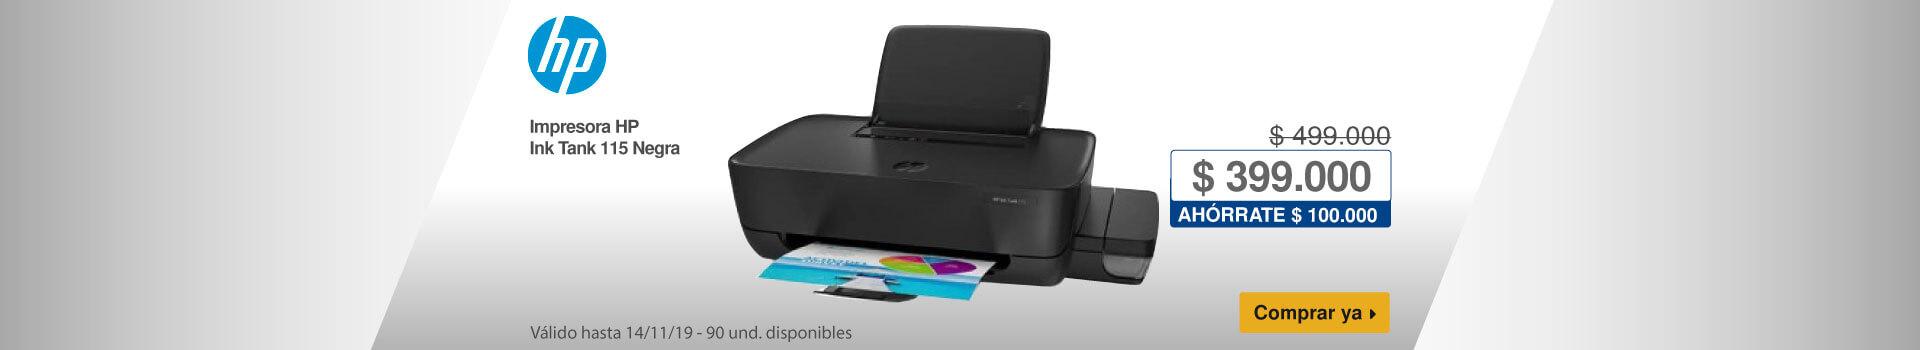 AK-KT-HP-impresora-InkTank-115-NgCAT-IMPRIMPRESION09_noviembre